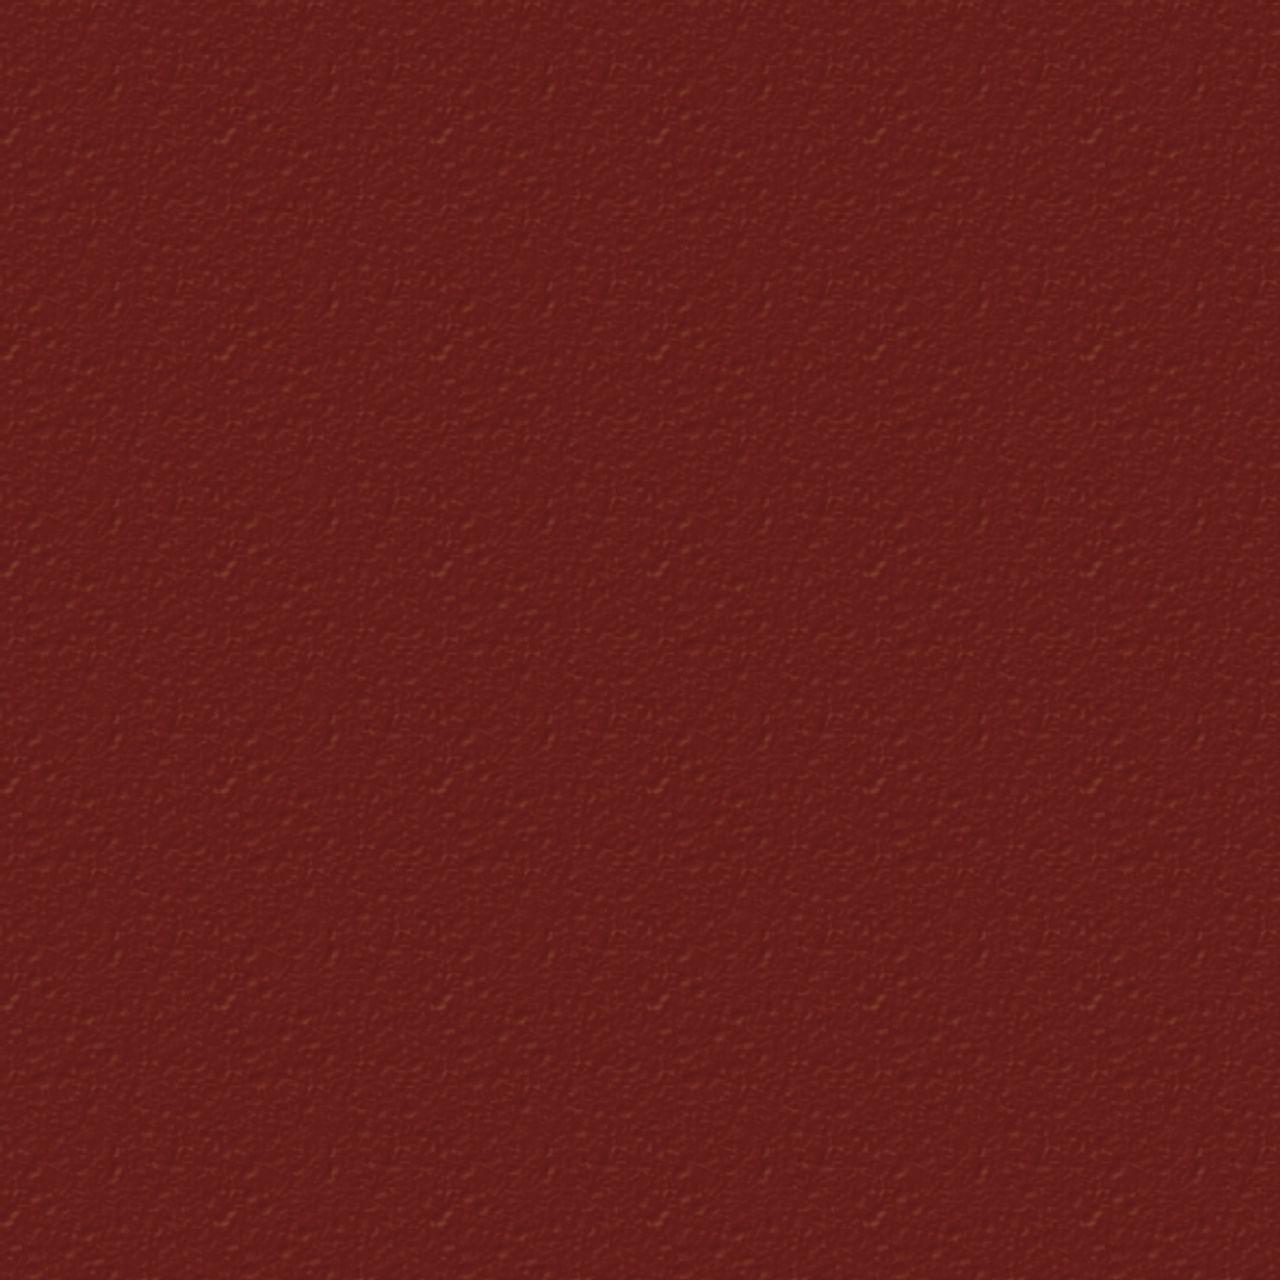 K12.6.3 Wine Red